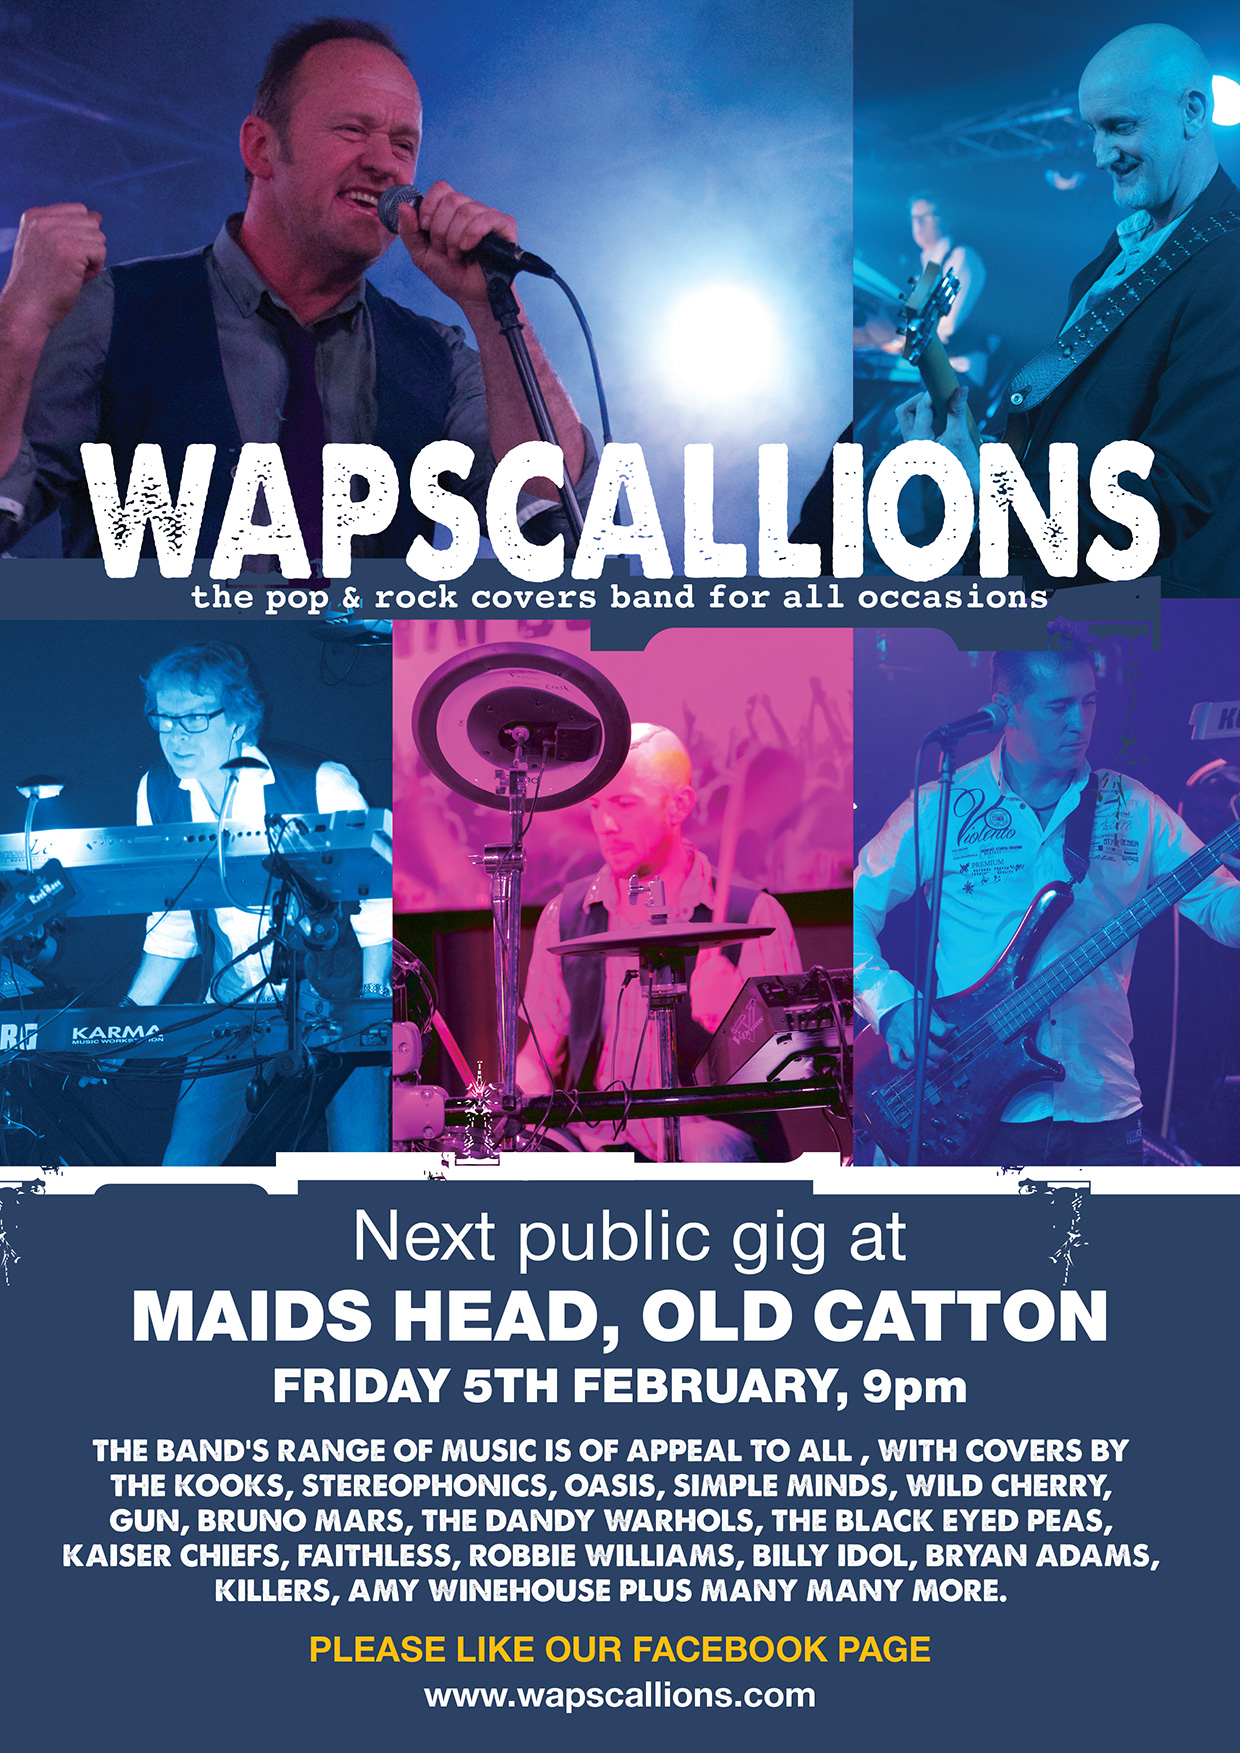 wapscallions gig Maids Head Old Catton 5th February 2016